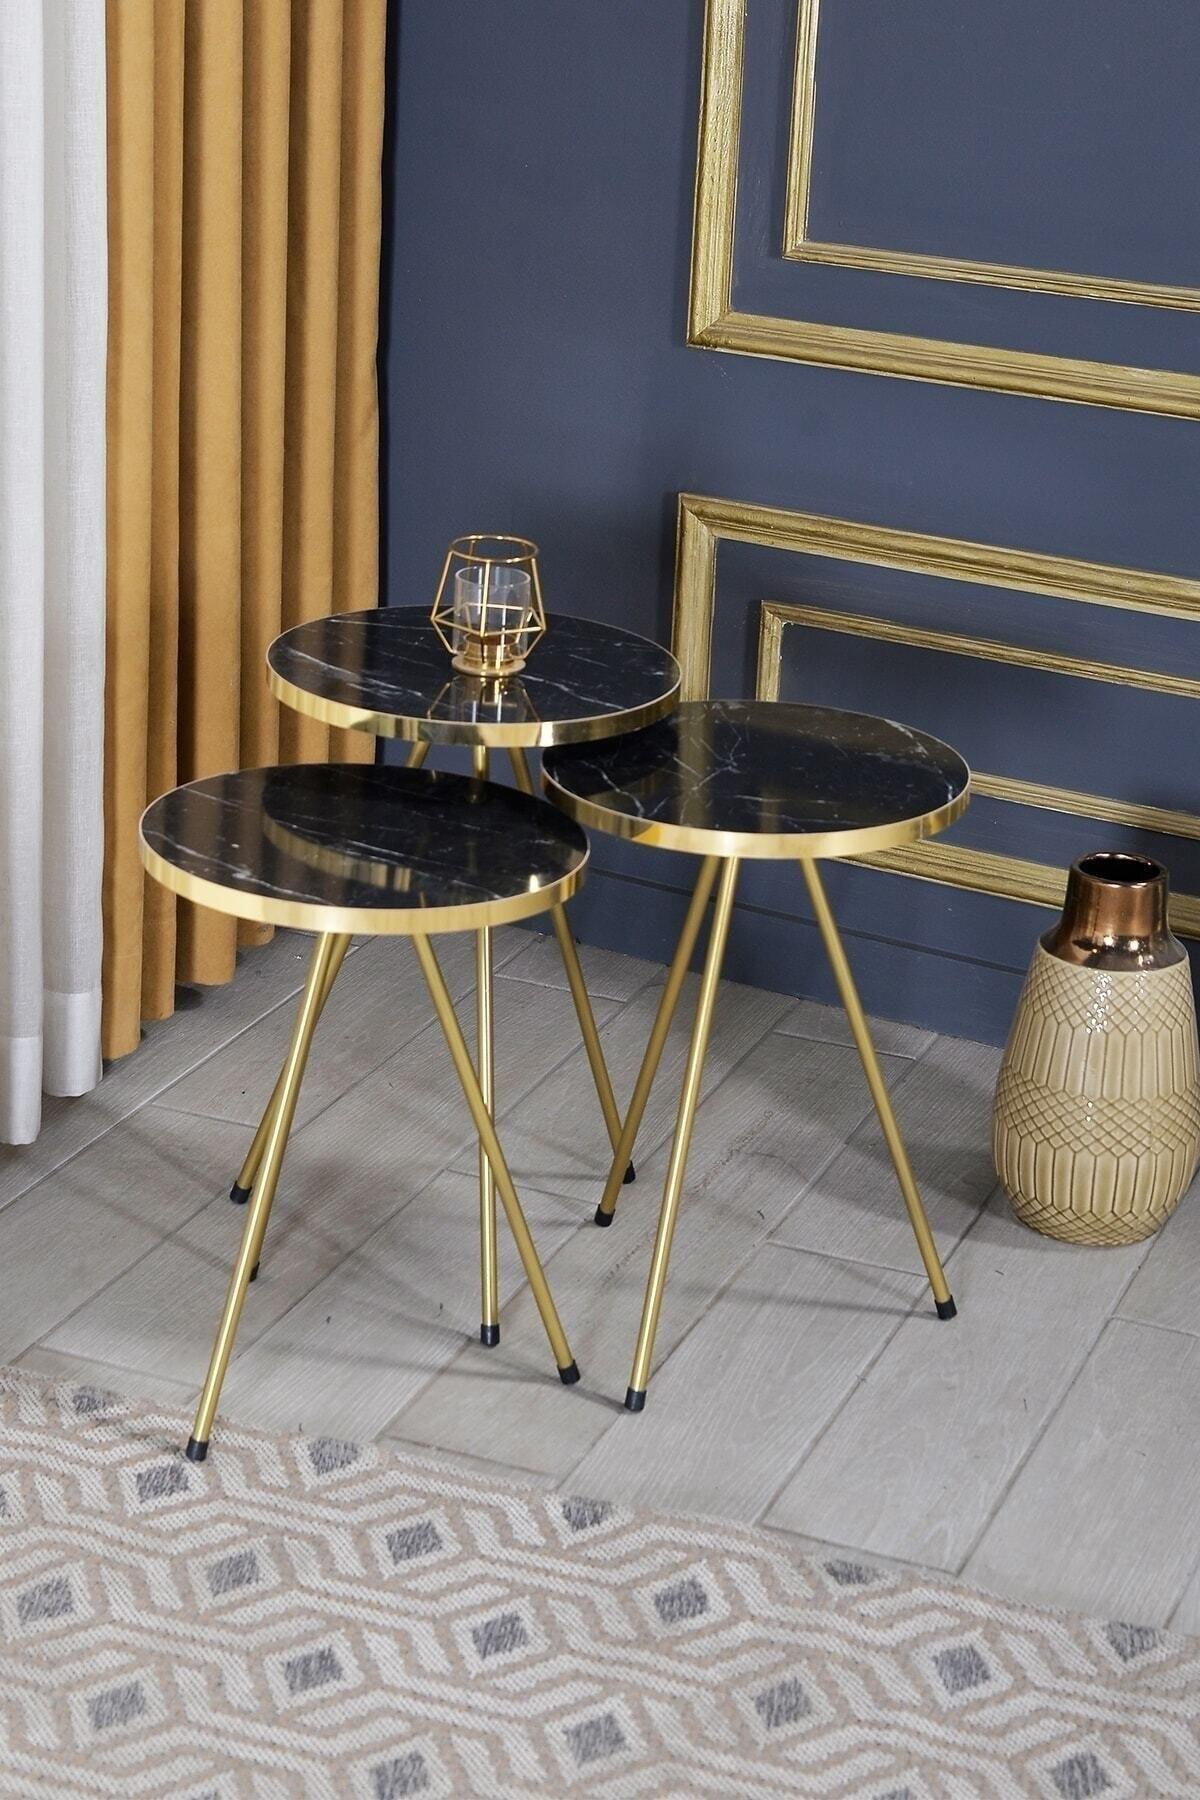 Zigon Coffee Table 3 pcs Gold Metal Toe Bendir Gold